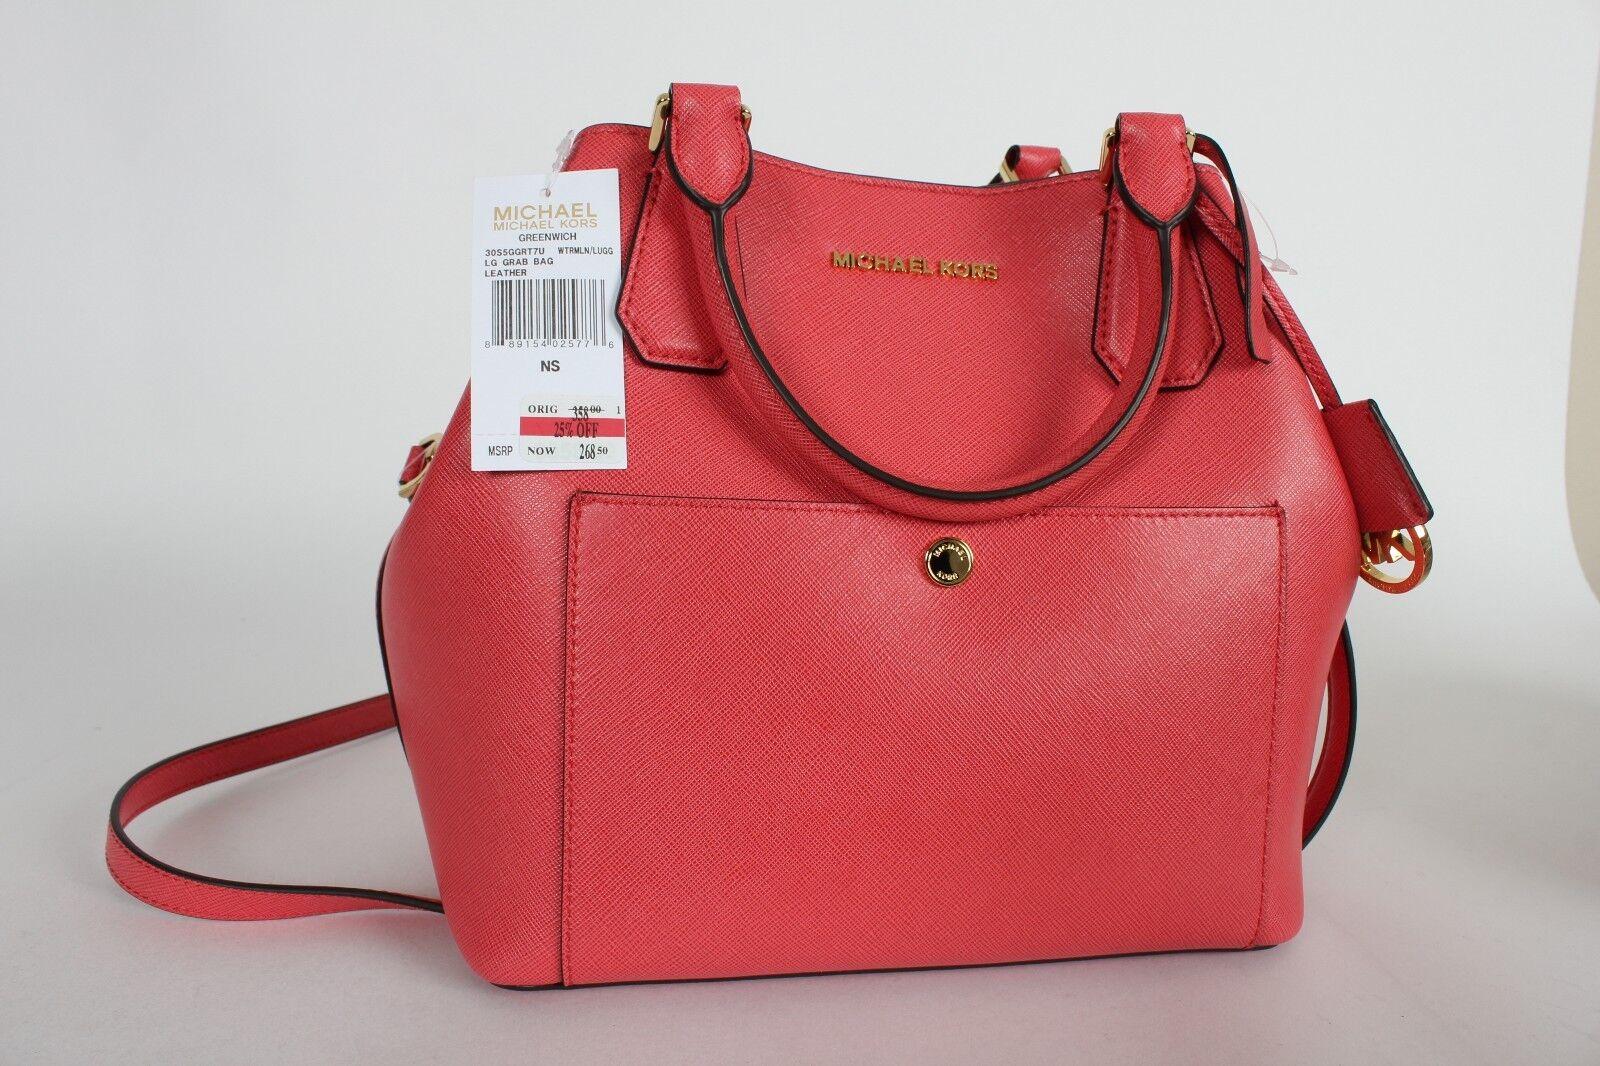 308bf261df66 Michael Kors Greenwich LG Grab Tote Handbag in Watermelon/luggage  30S5GGRT7U for sale online   eBay